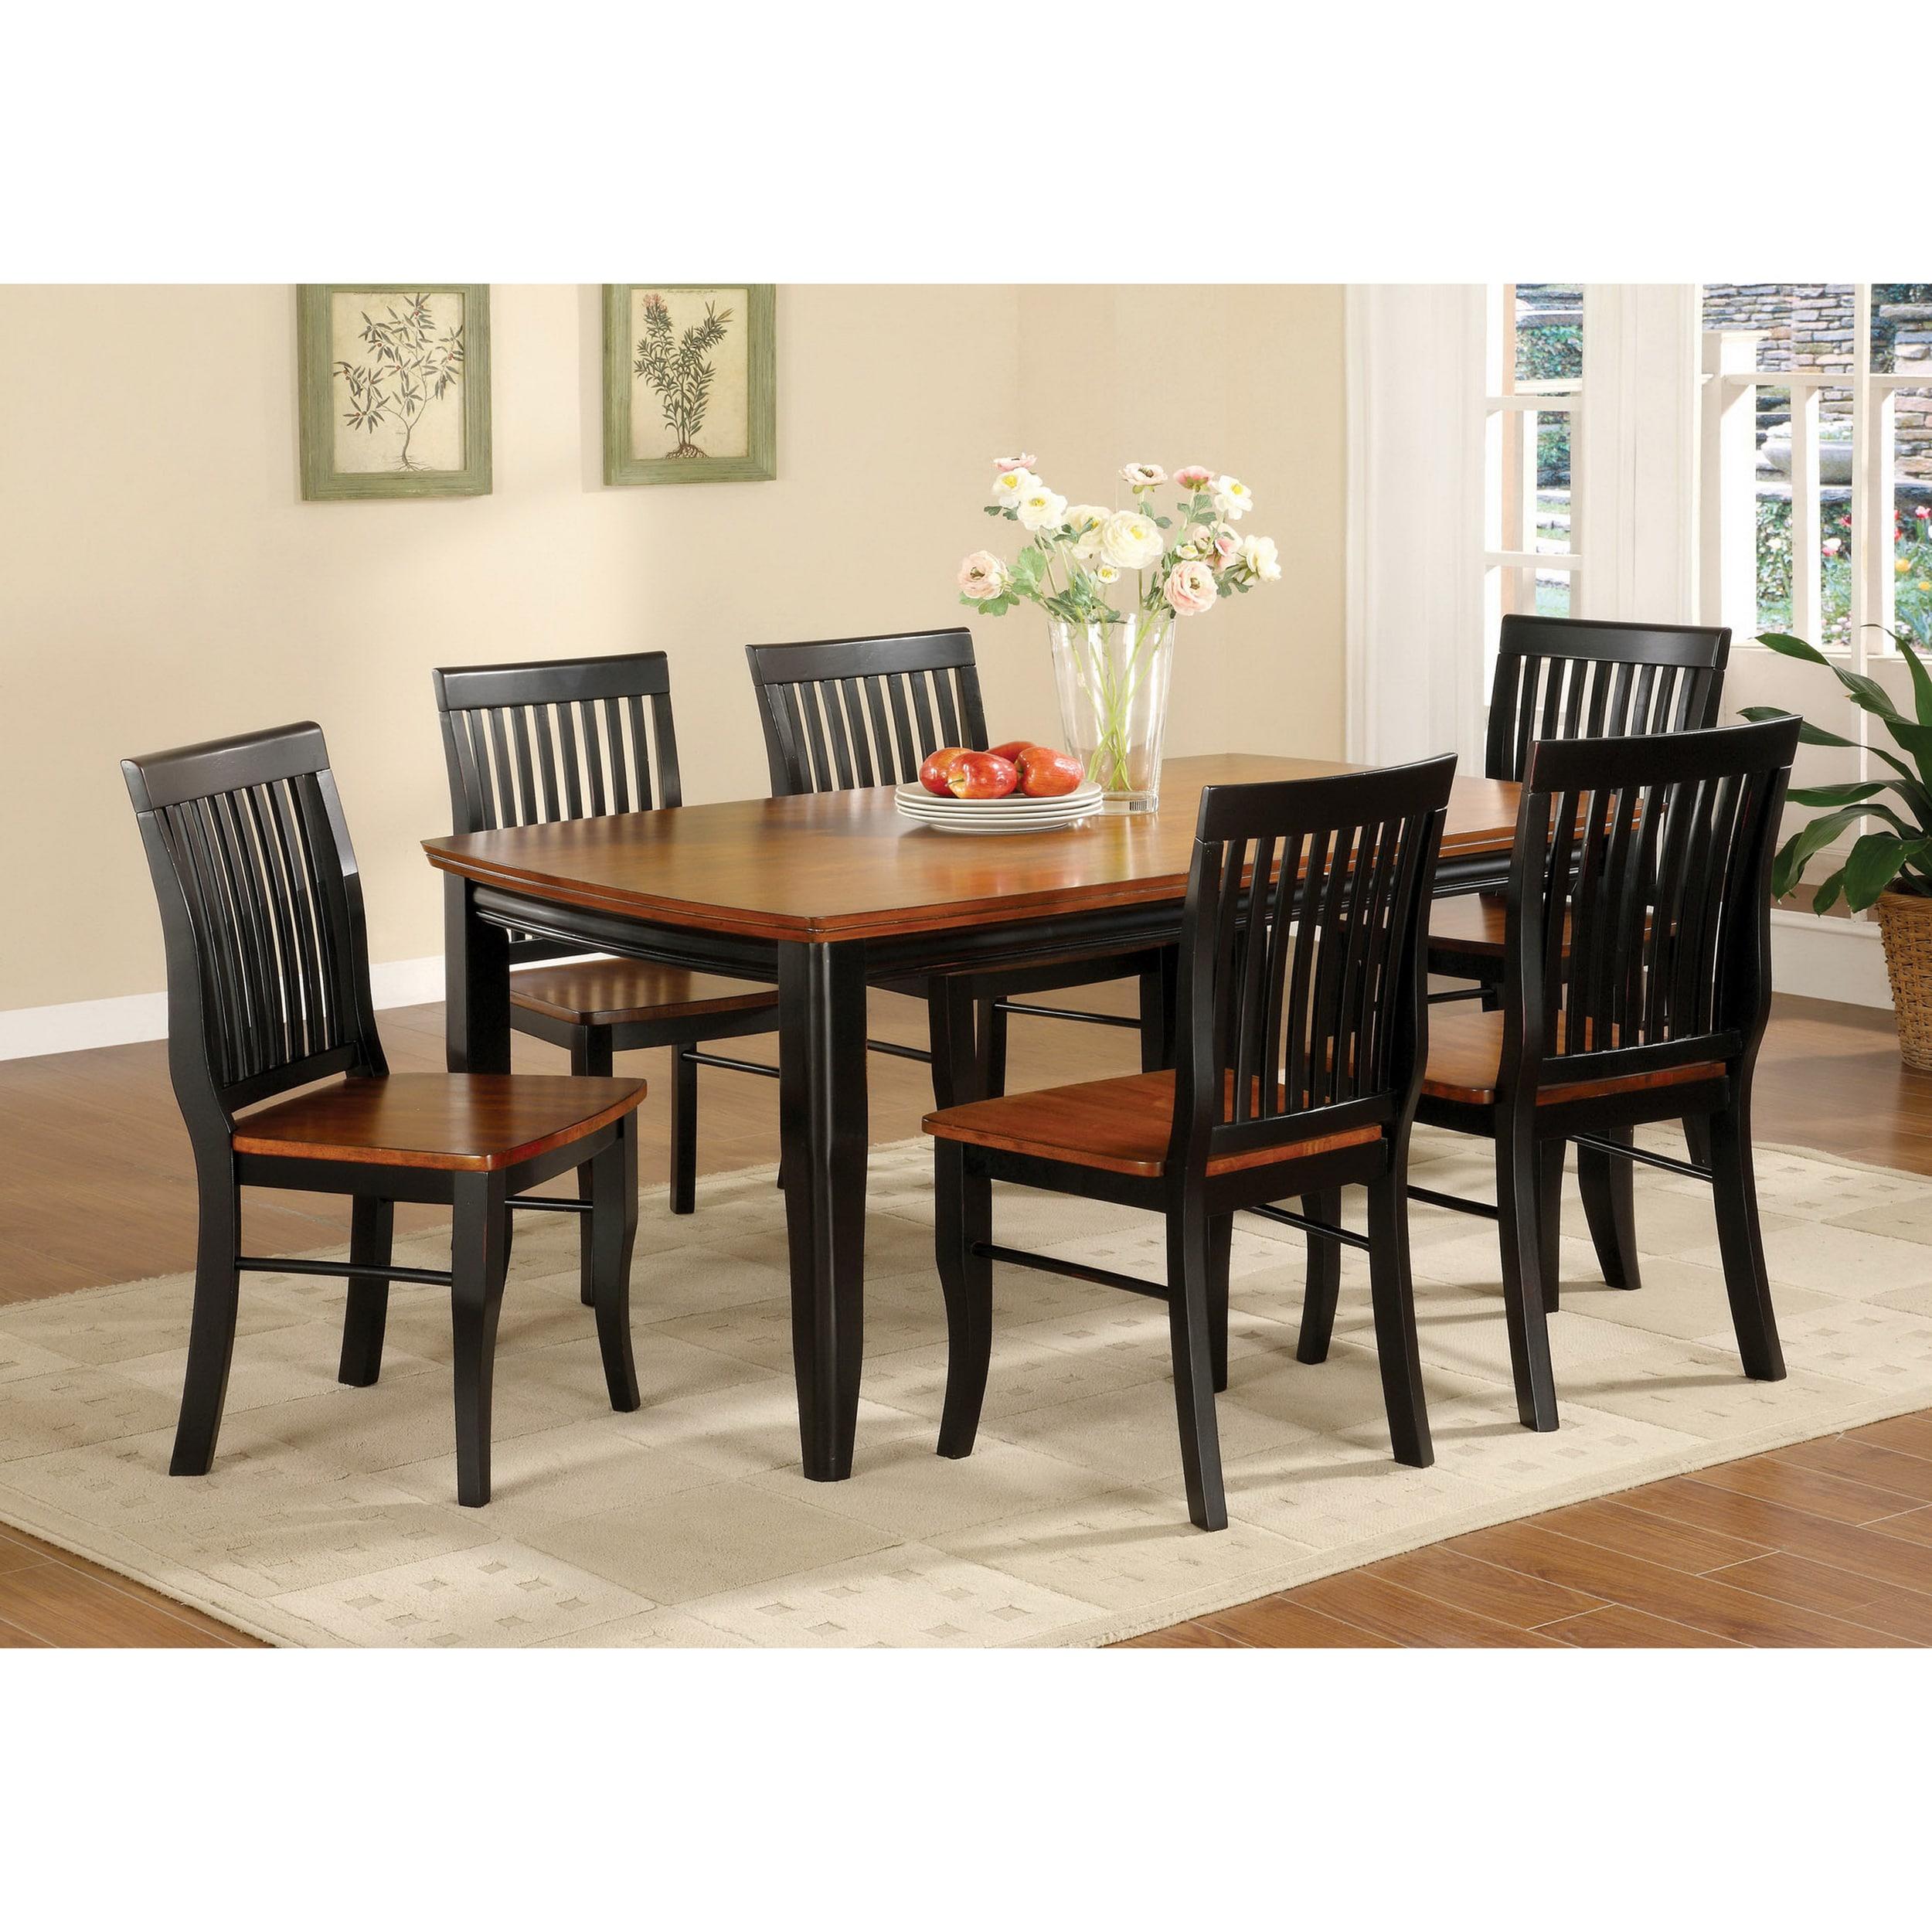 Furniture Of America Burwood Antique Oak Black Wood Dining Table